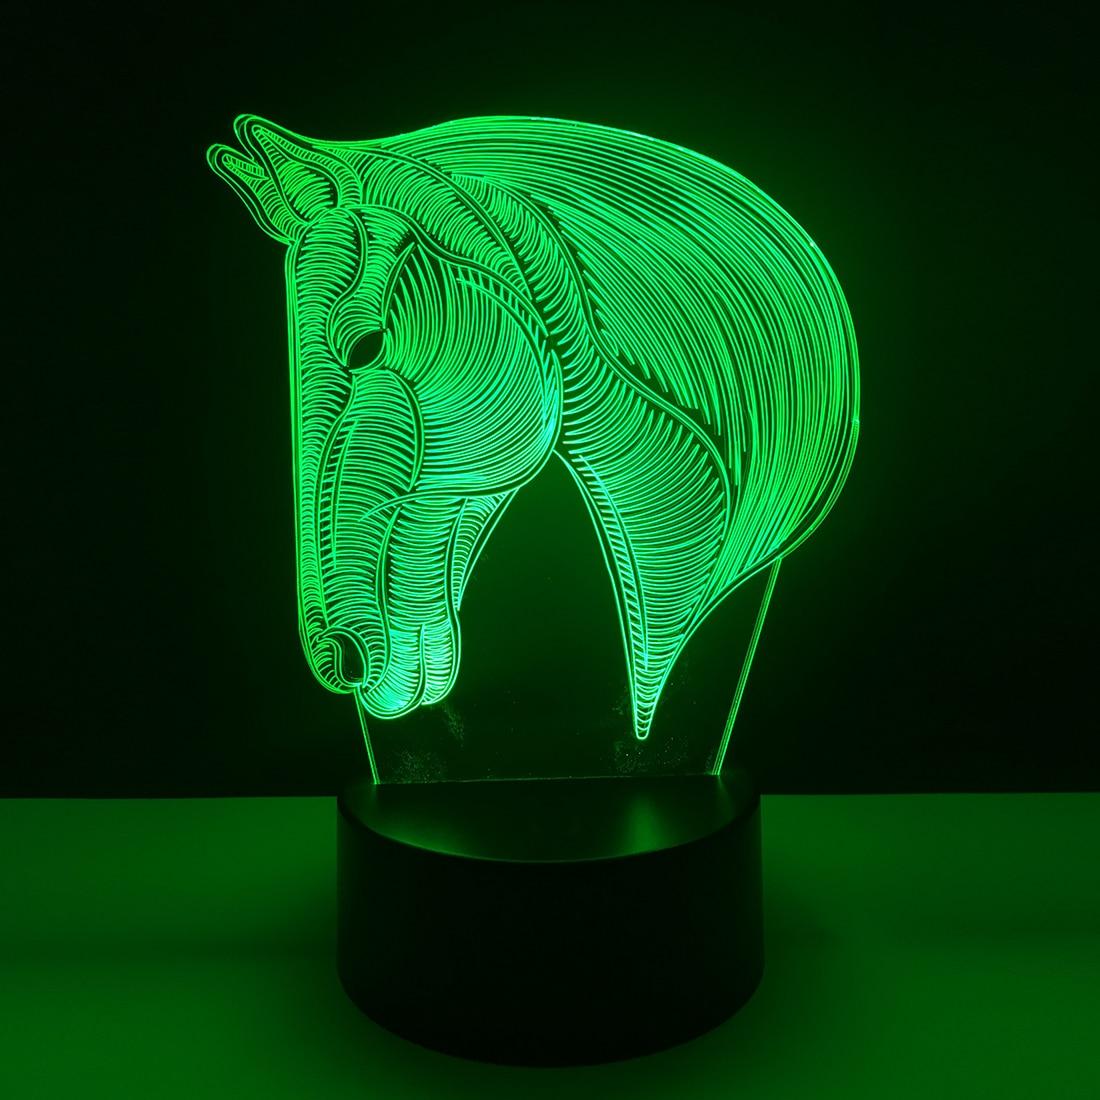 7 Colors Changing Animal LED Night light Horse 3D Desk Table Lamp USB Luces Navidad Lampara Kid Sleeping Novelty Nightlight